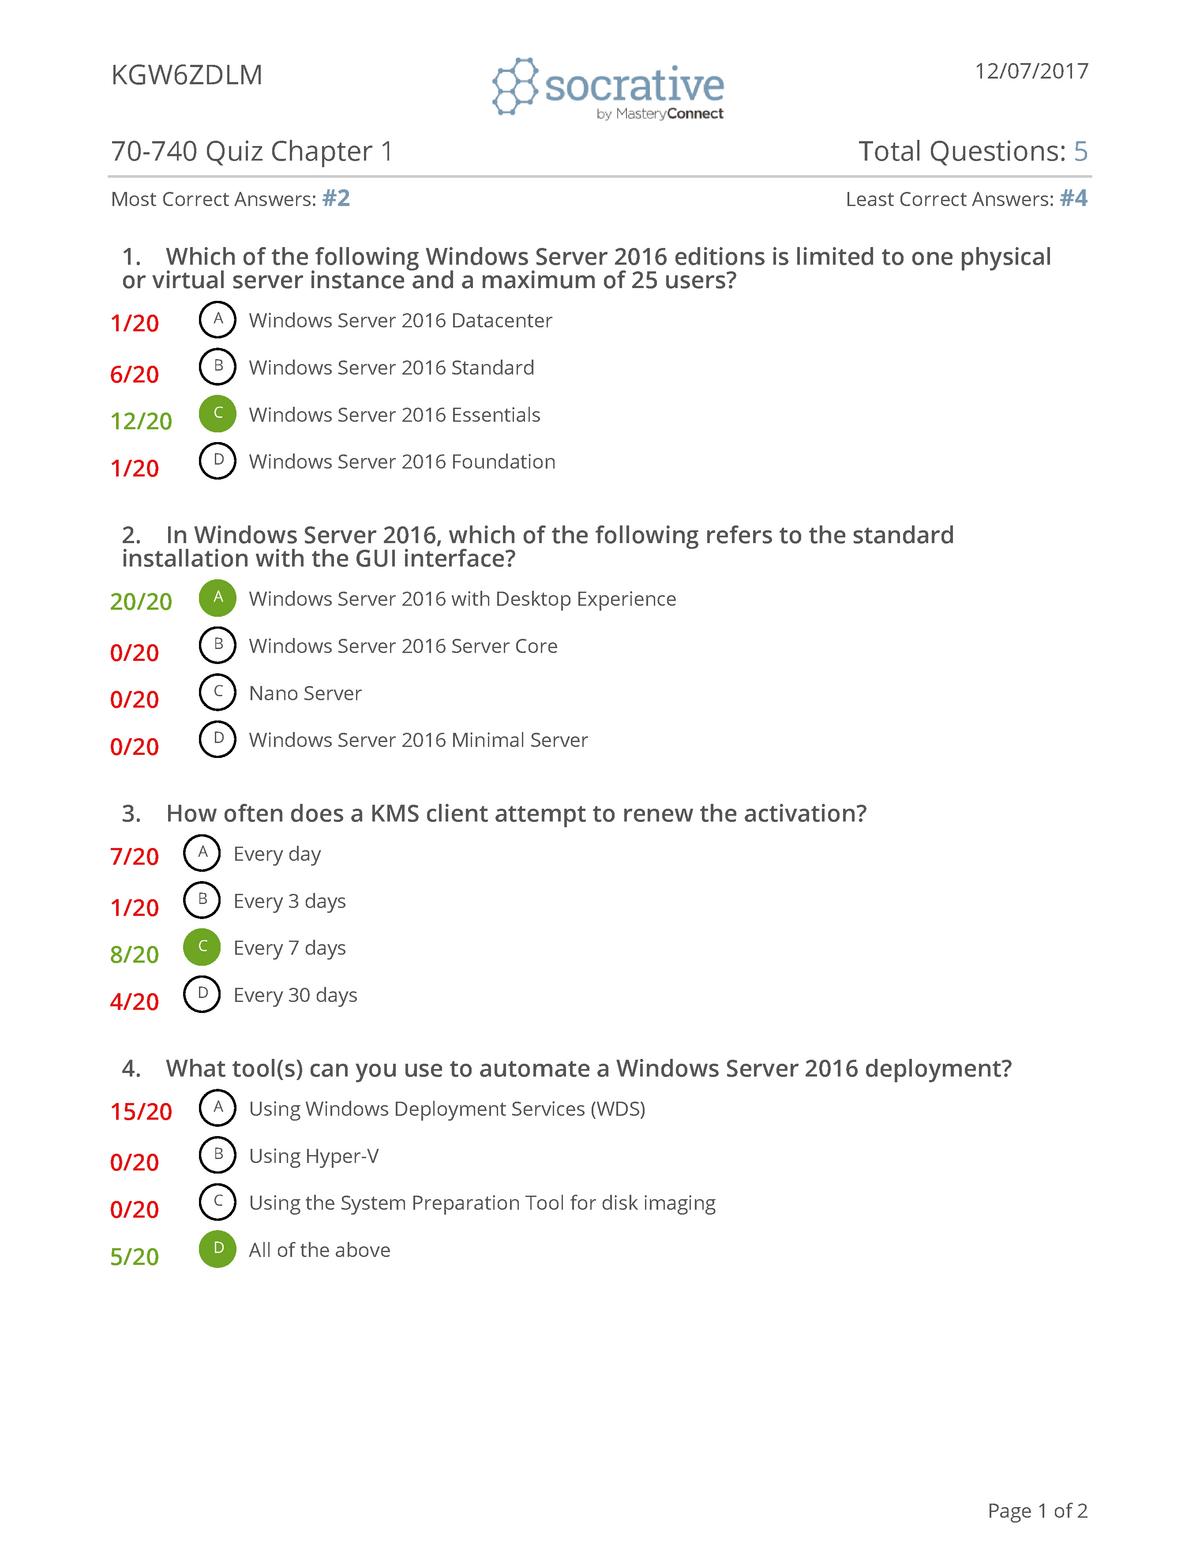 Tentamen 2018 - 1: Microsoft - StudeerSnel nl